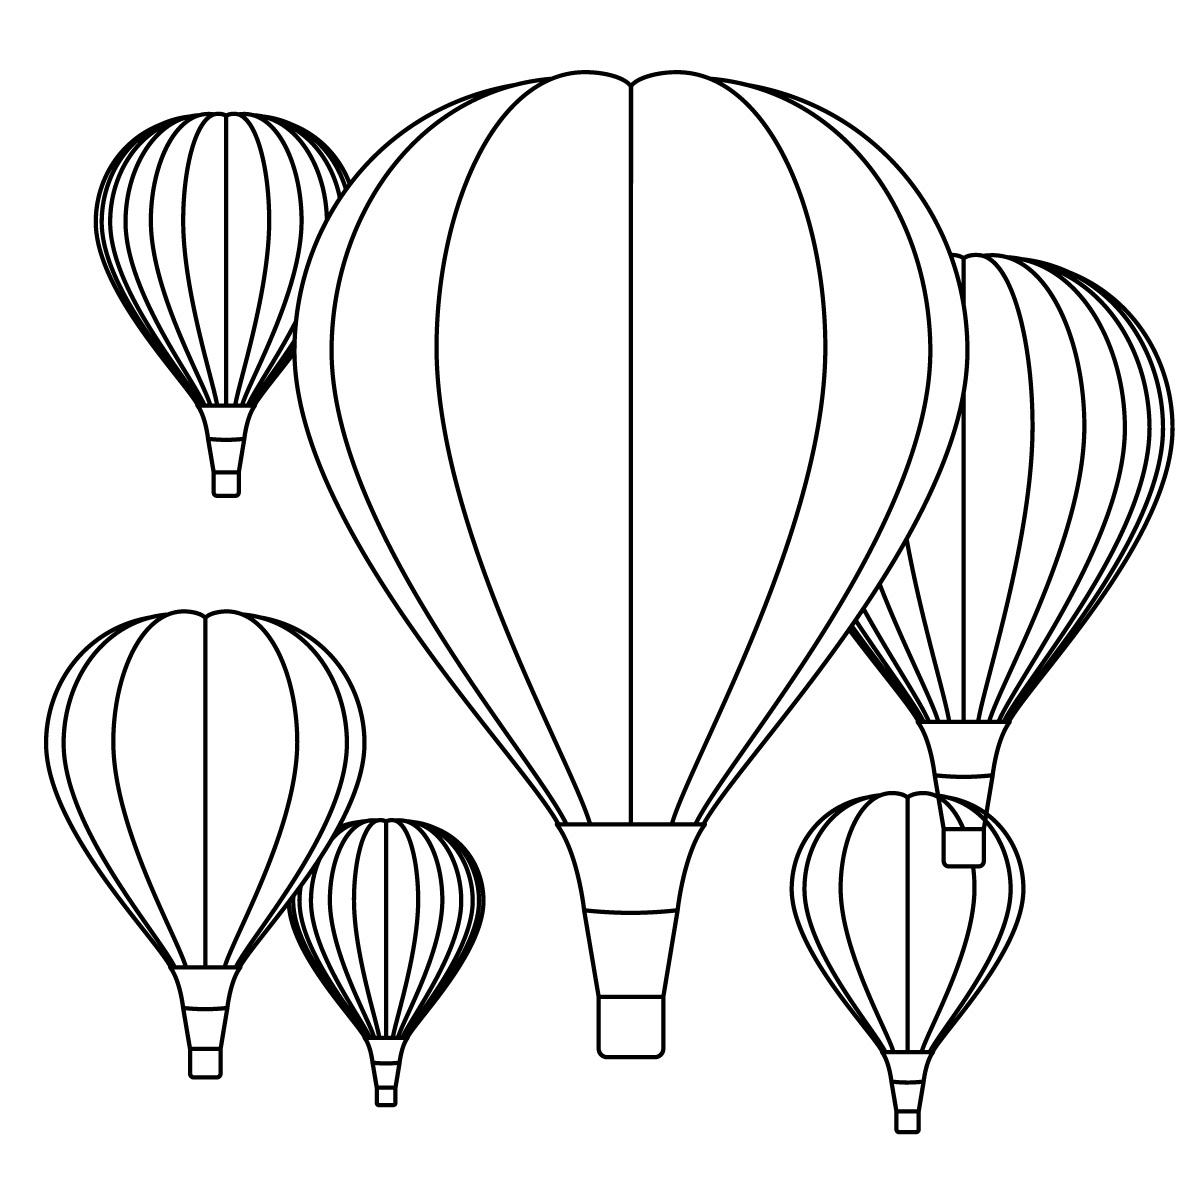 1200x1200 Hot Air Balloon Clipart Line Drawing